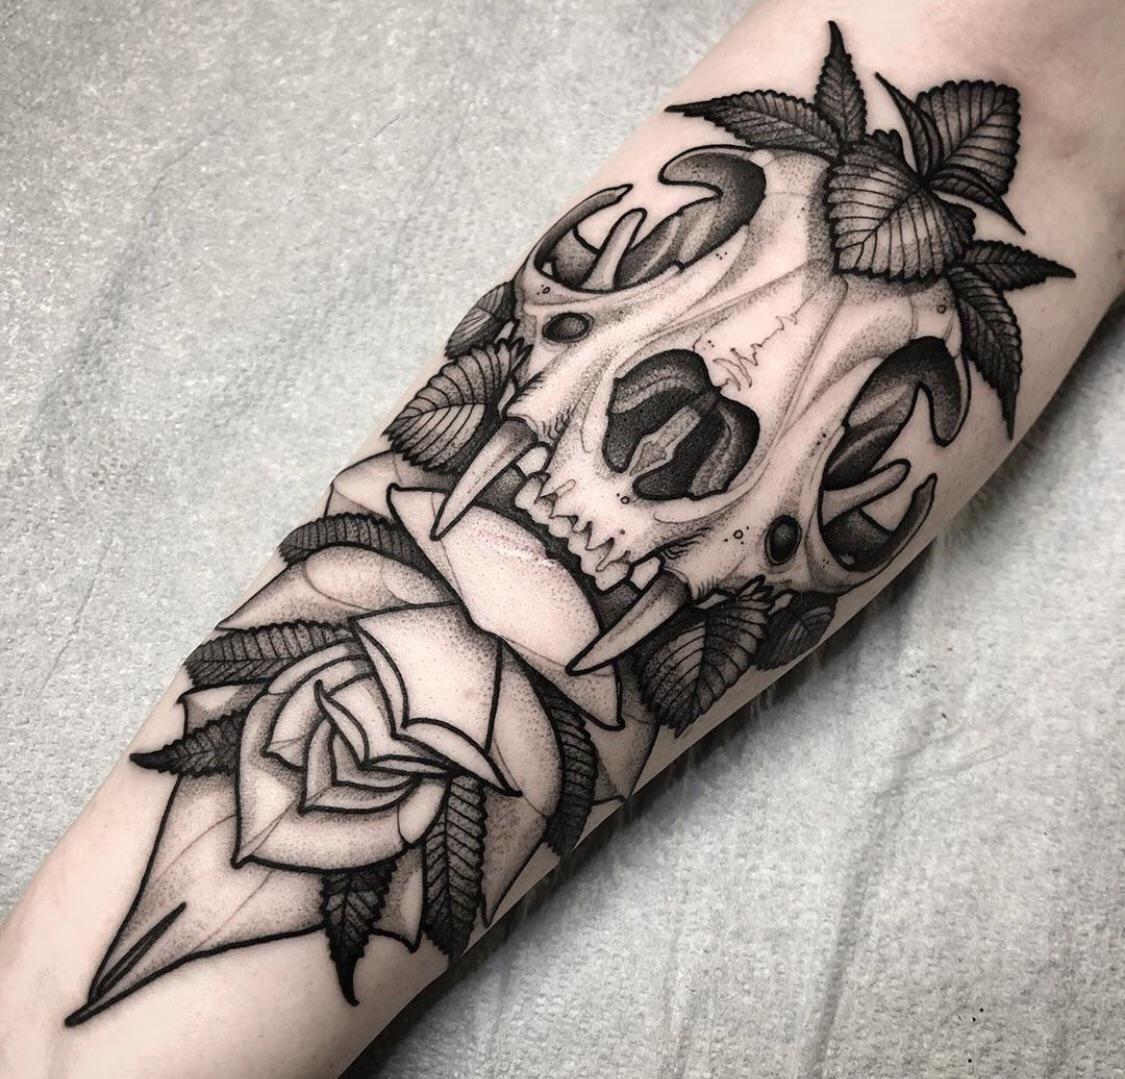 Cat skull with catnip rose and hemp leaves artist richard